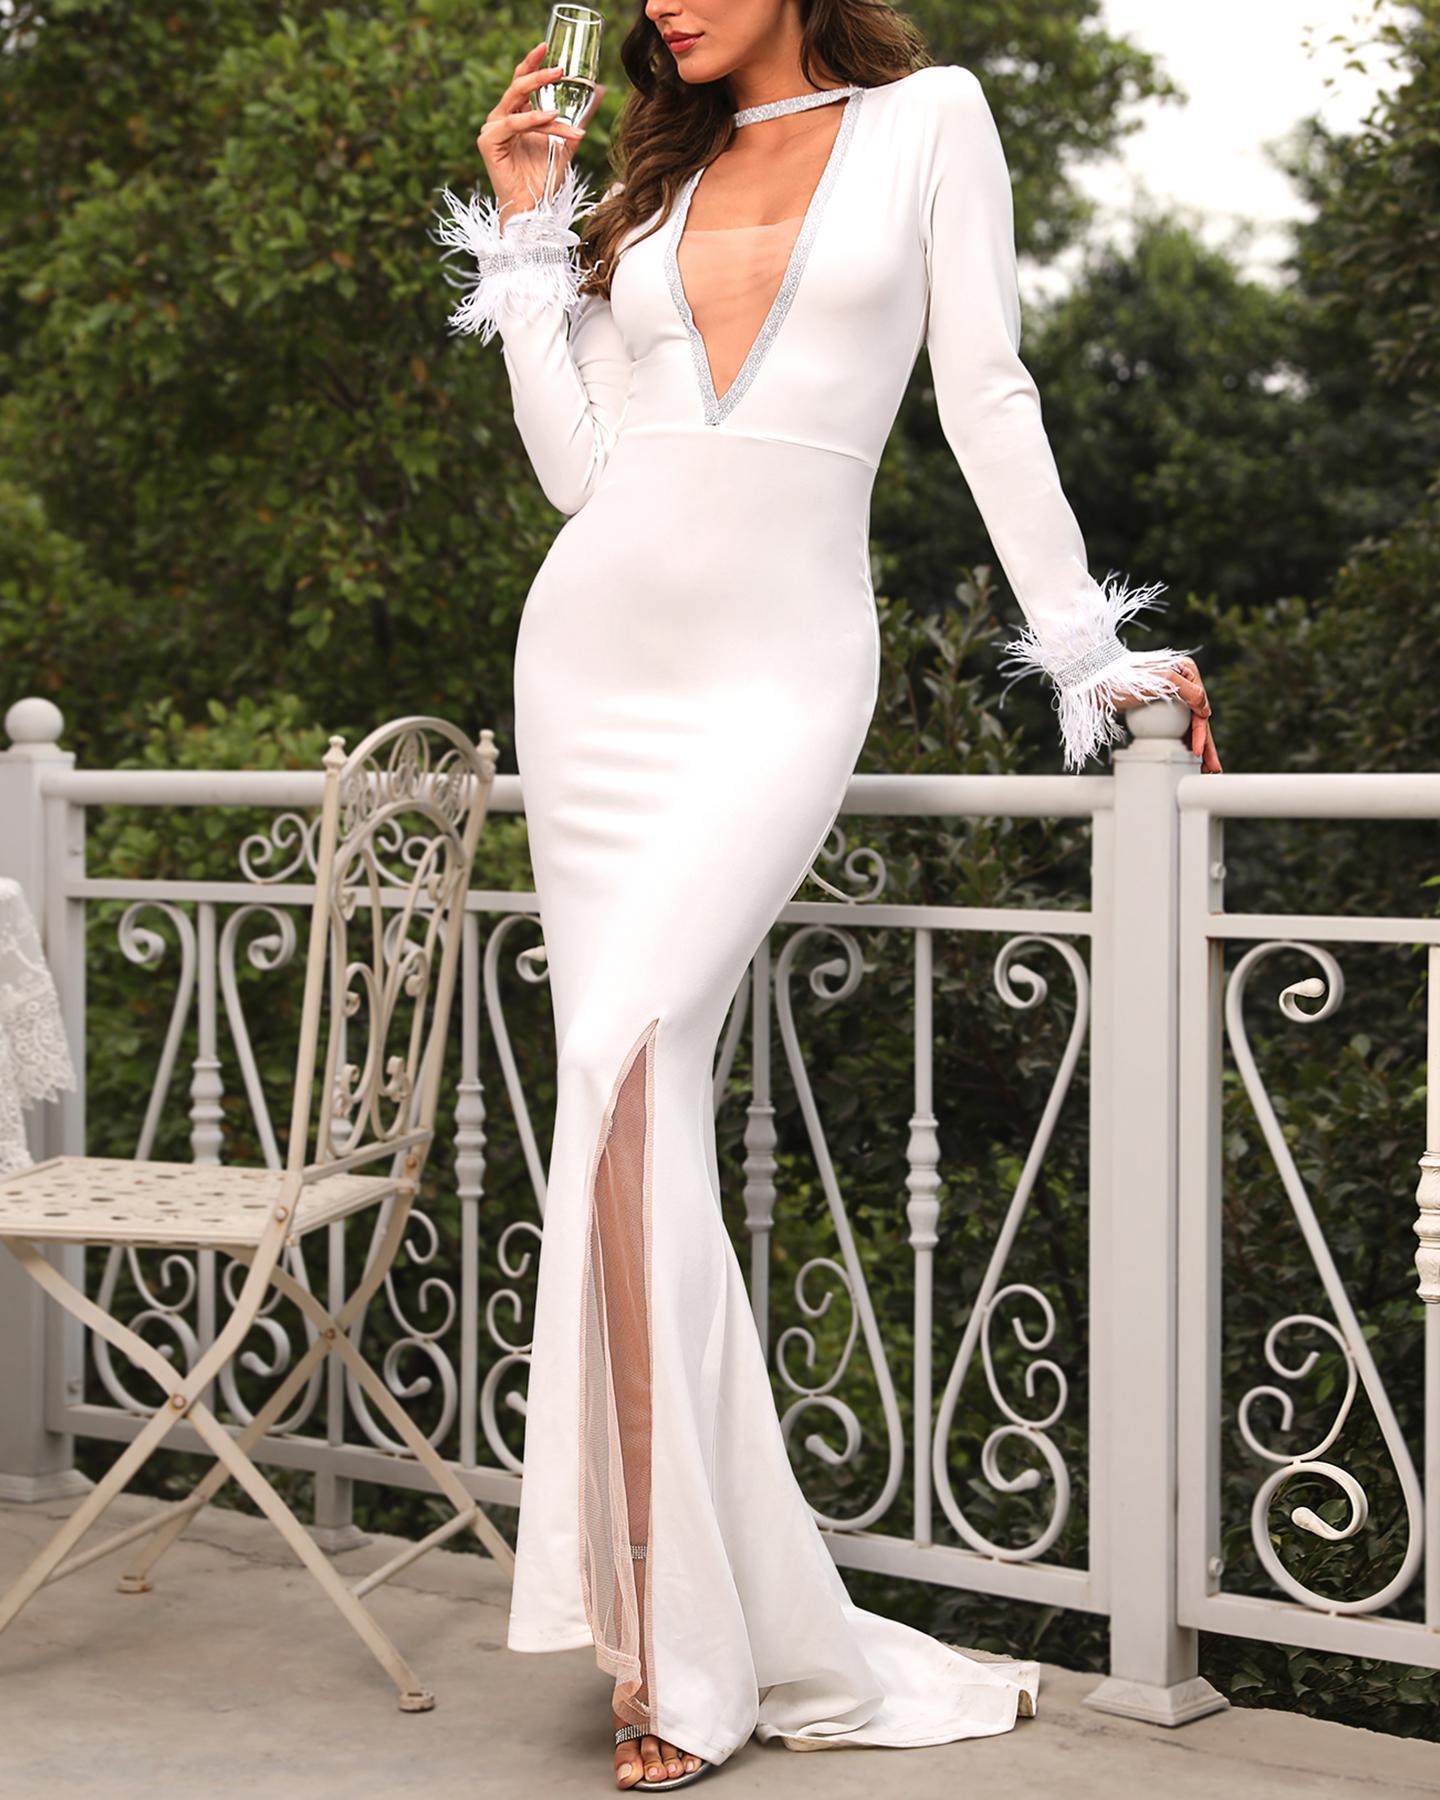 Sequin Feather Mesh Slit Evening Dress фото